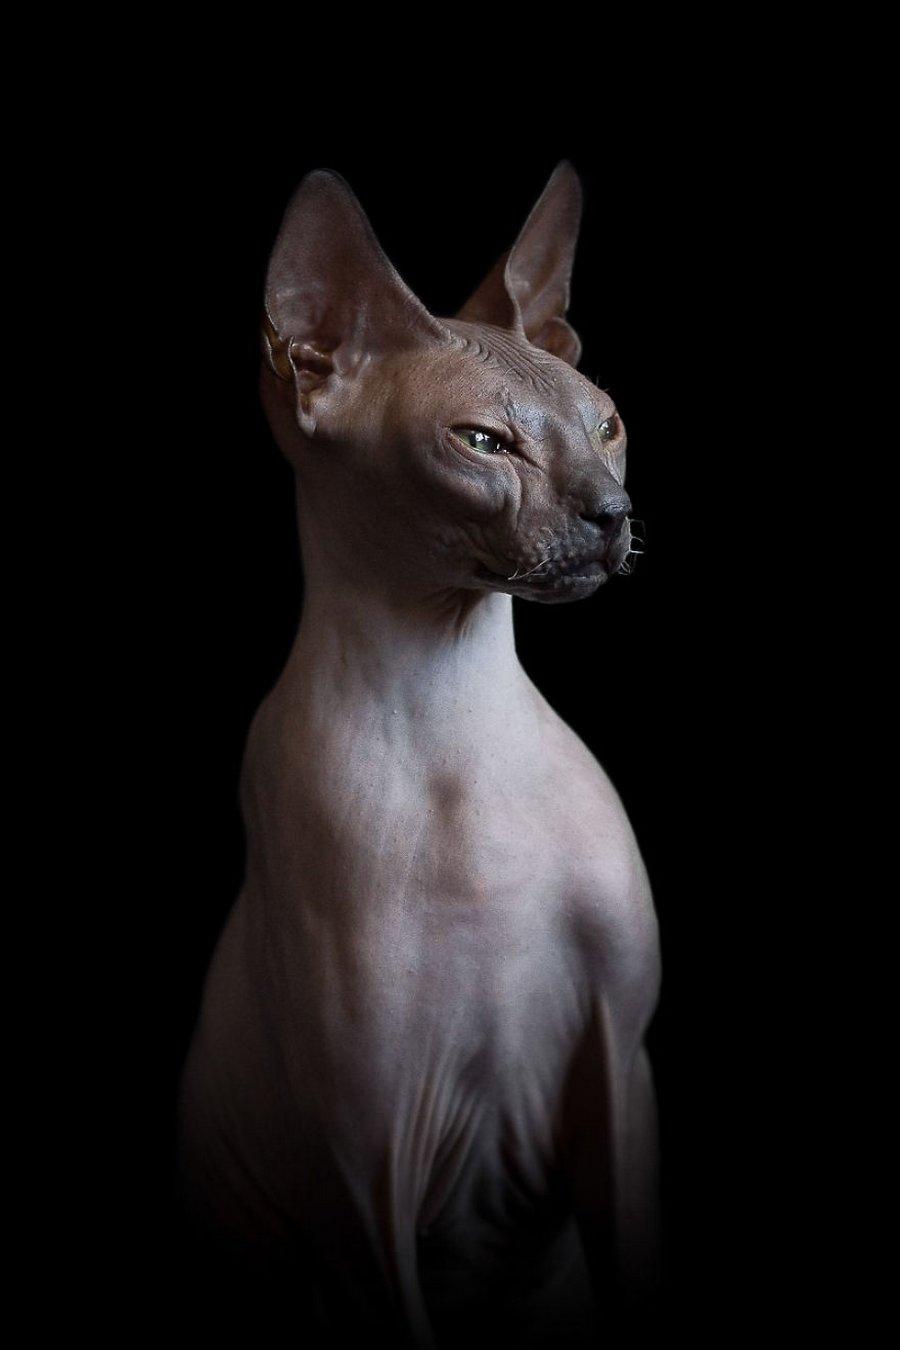 furless-portrait-photography-sphynx-cats-alicia-rius-8